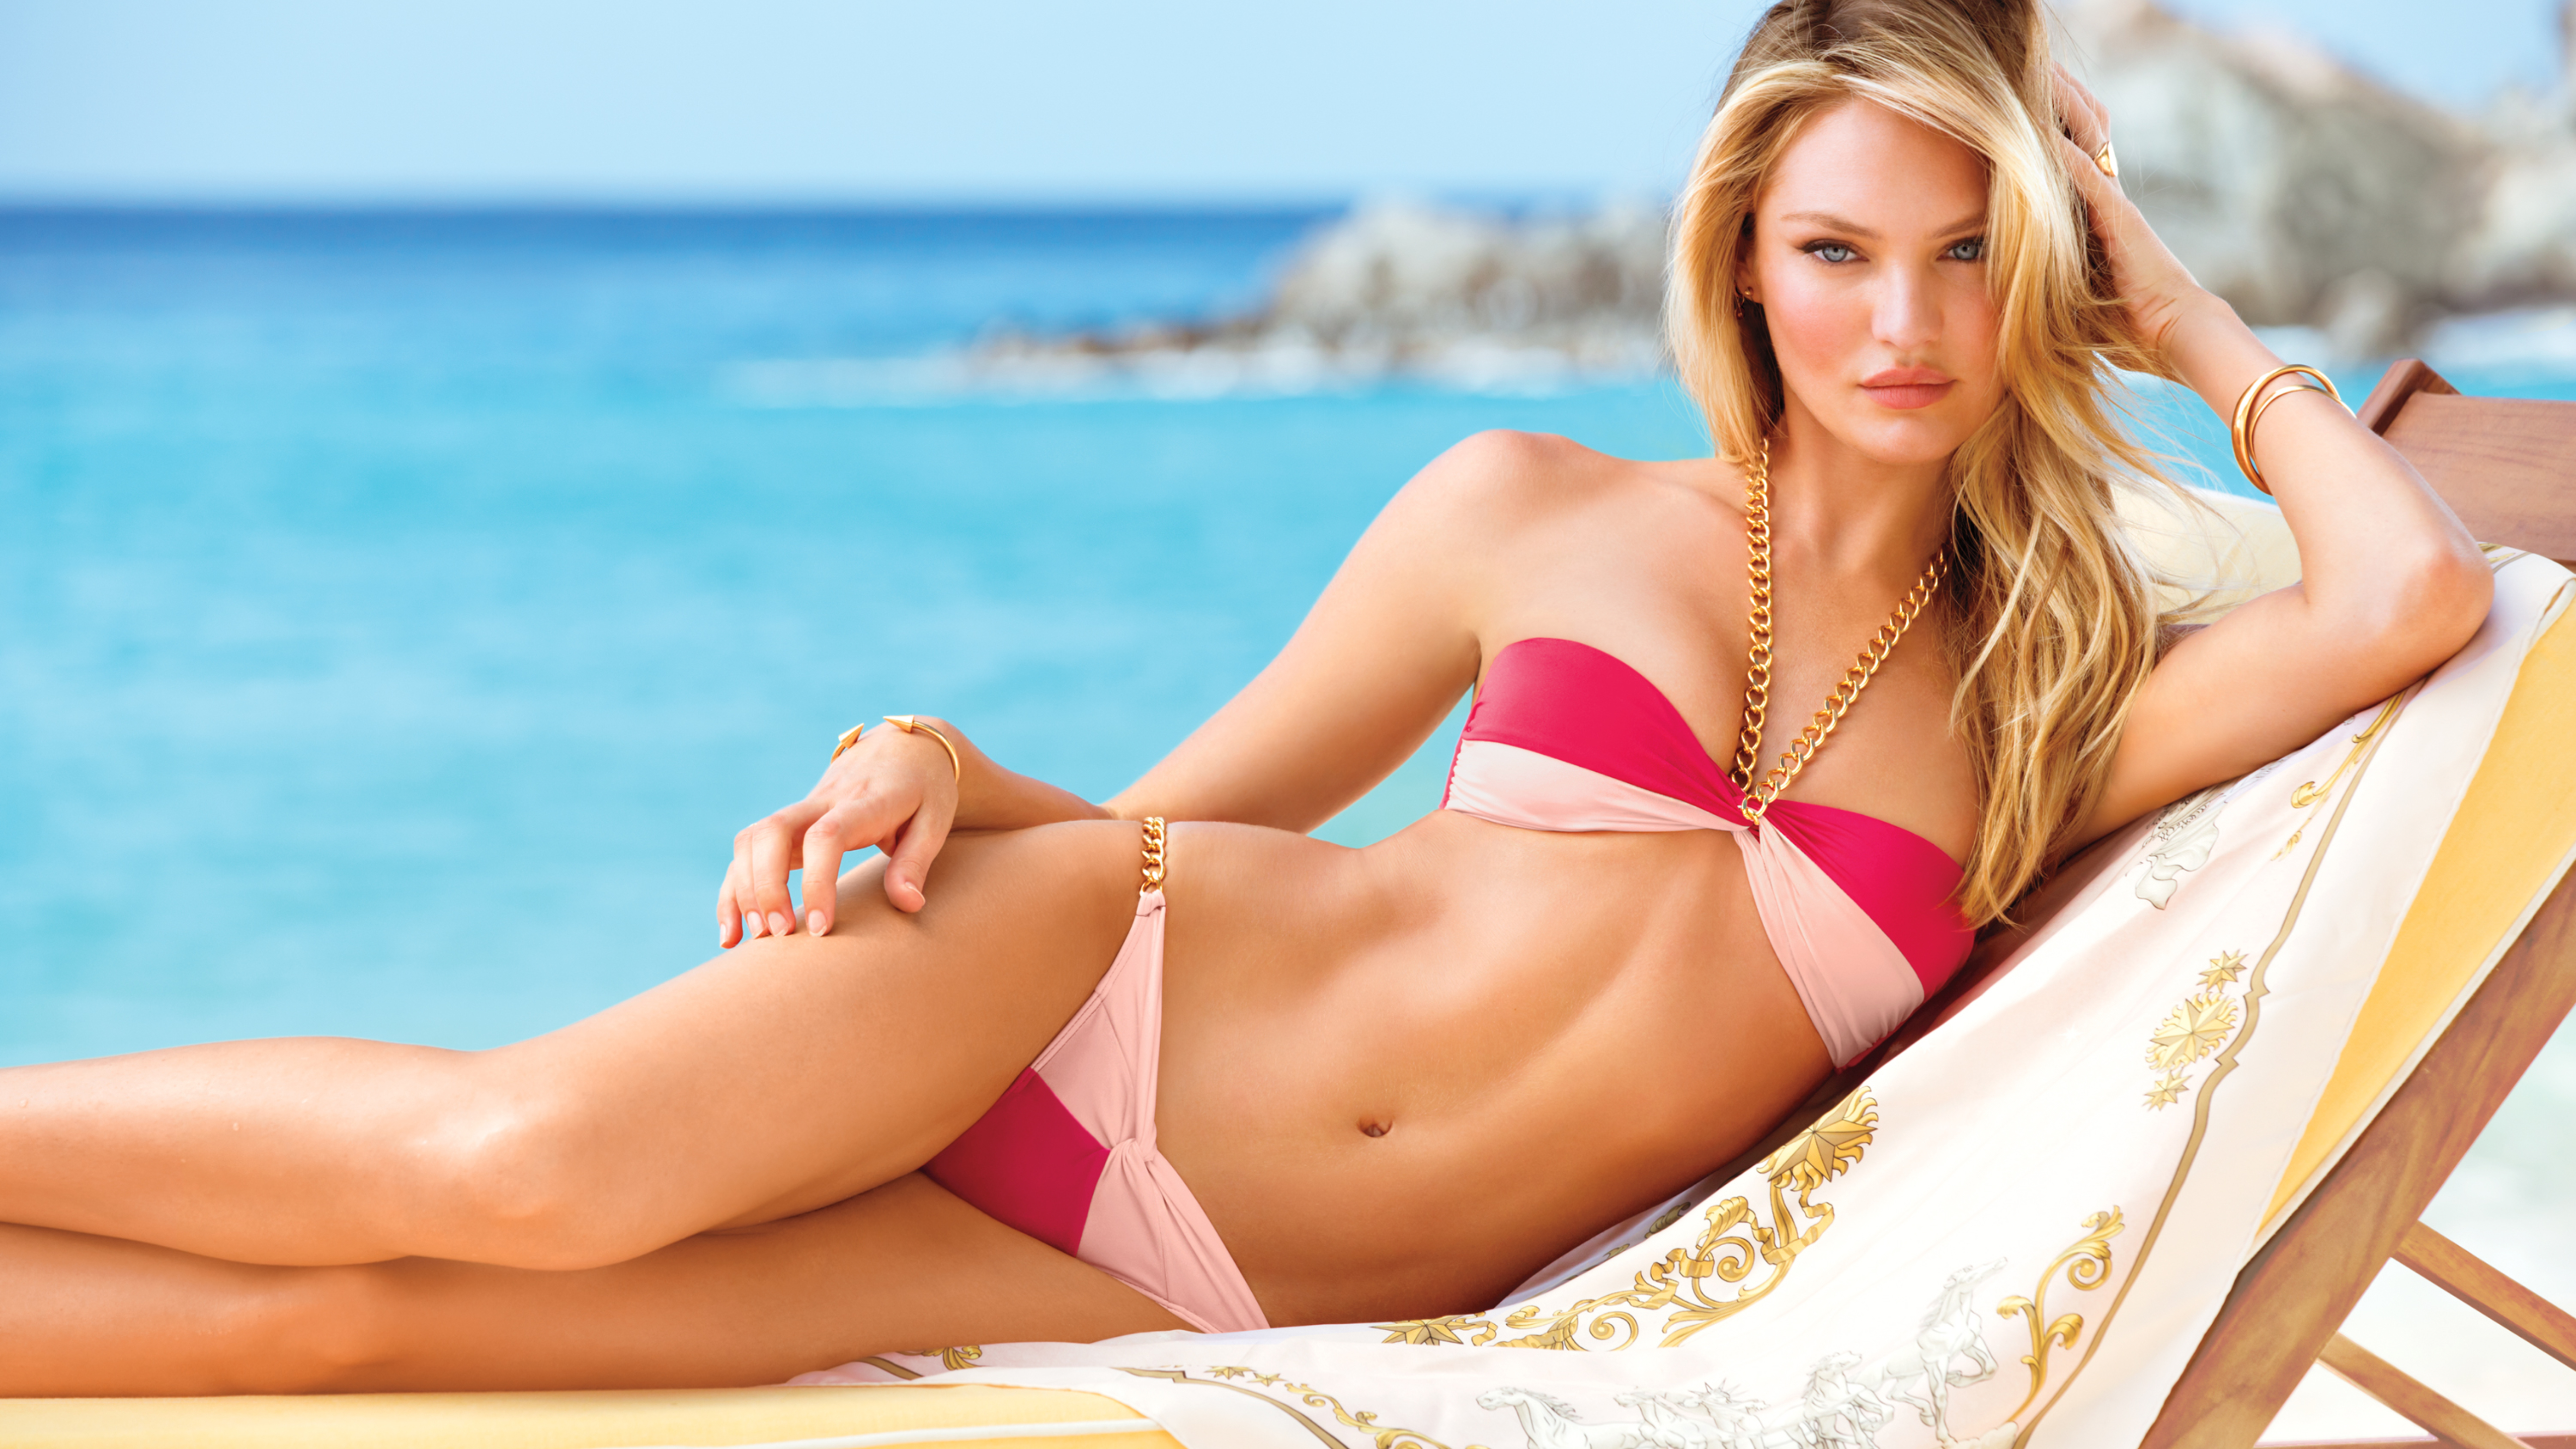 Bikini commercial